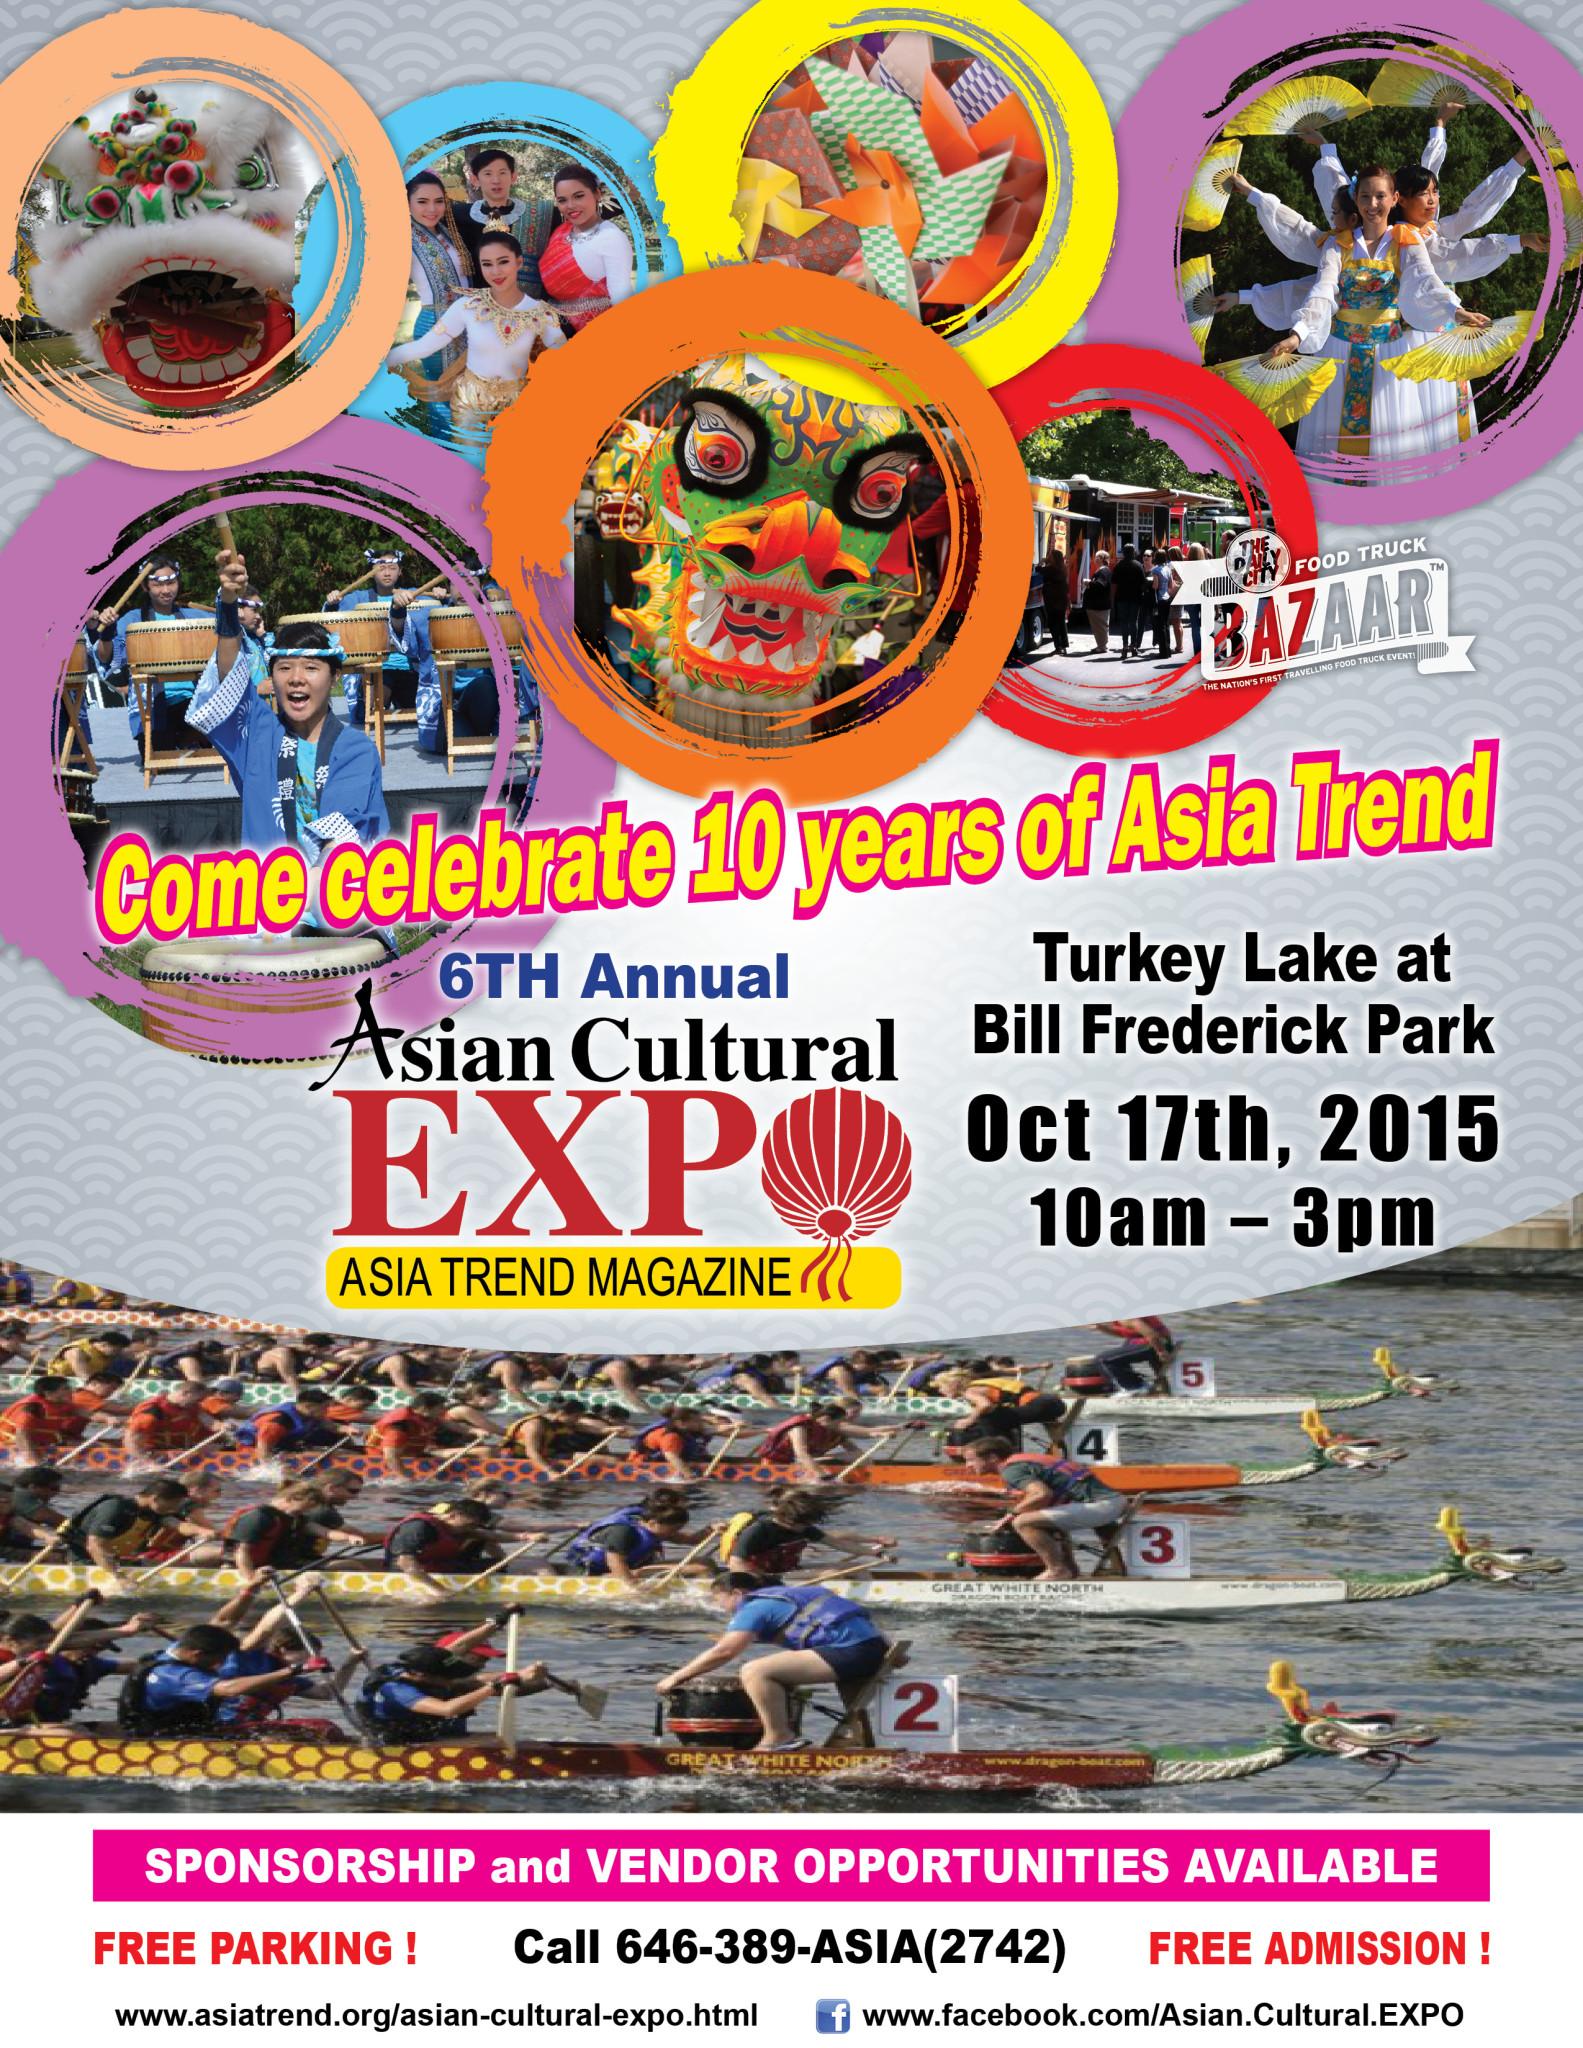 6th Annual Asian Cultural EXPO